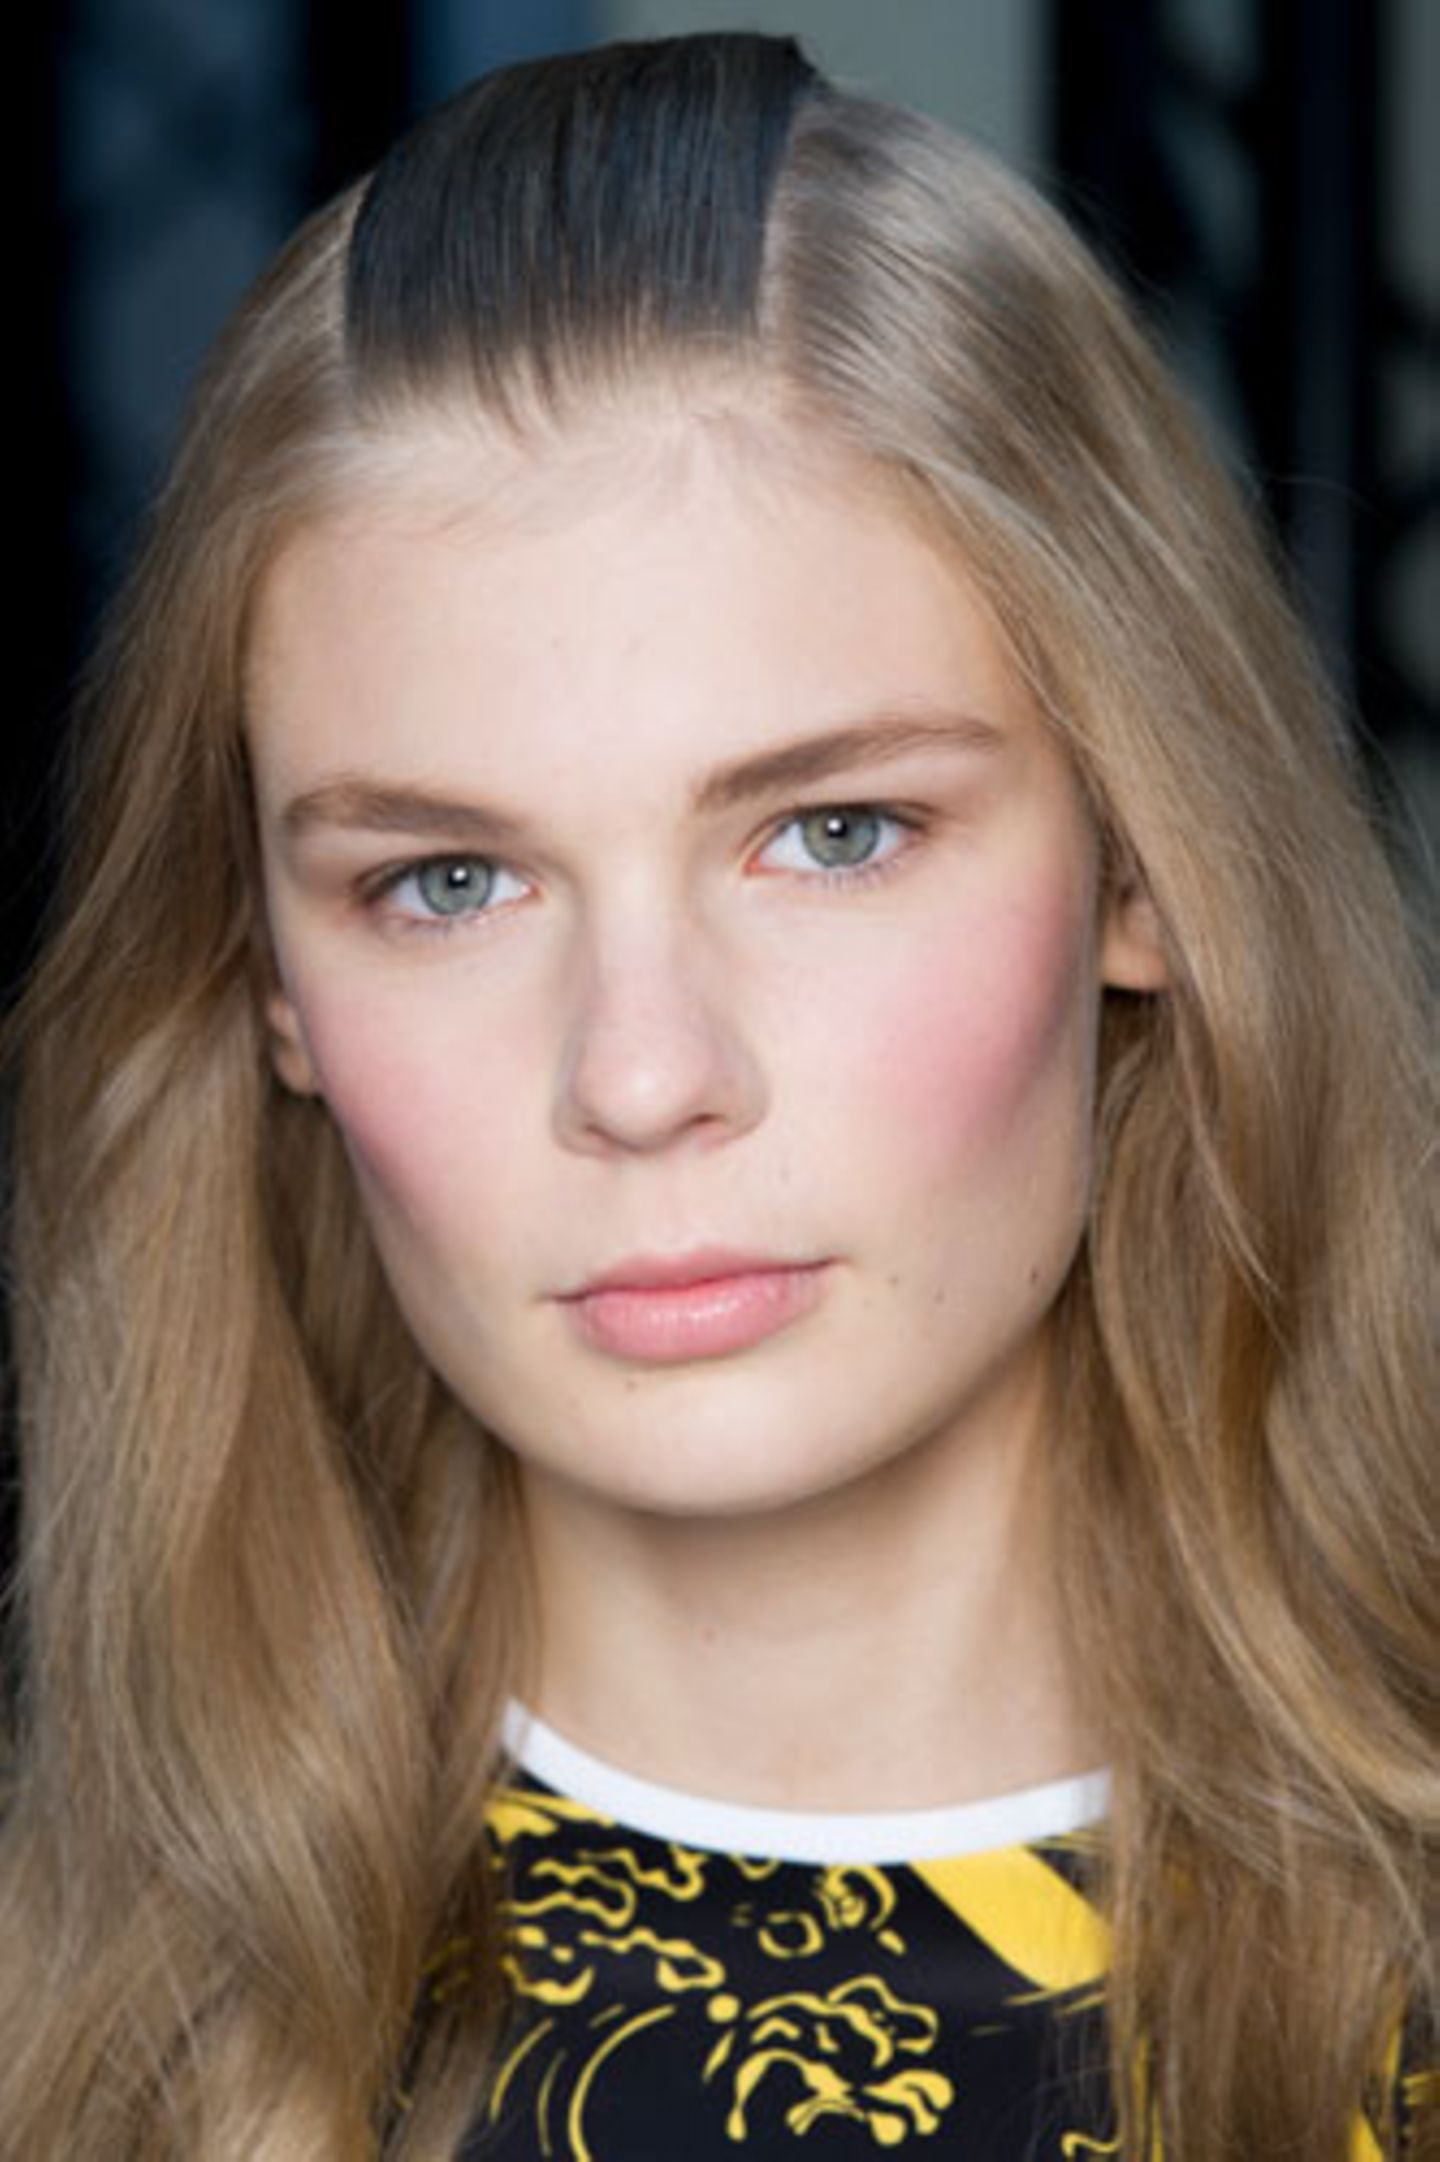 Wie wirkt Make-up: Rosige Wangen